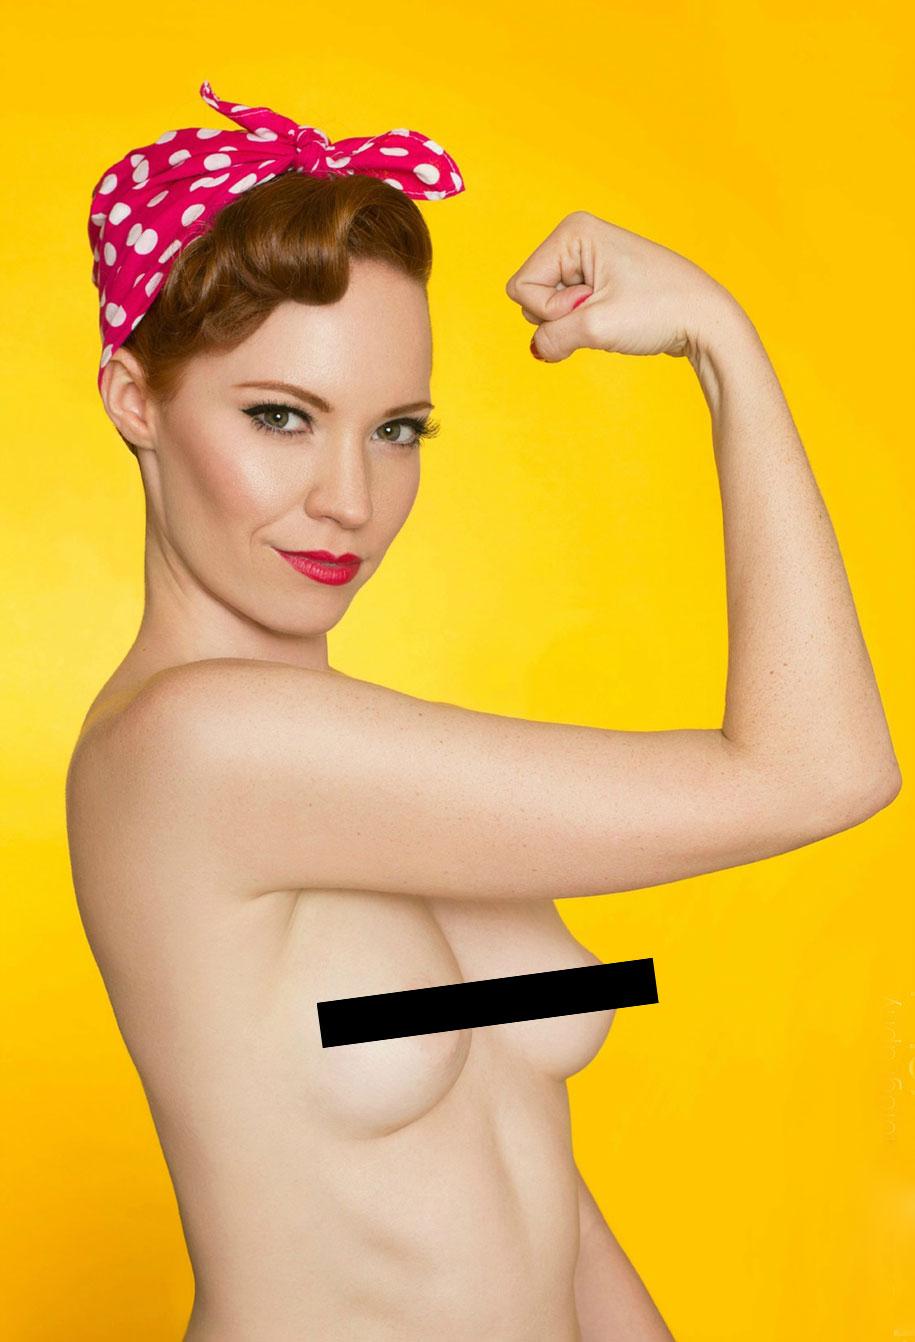 cancer-mastectomy-photo-series-my-breast-choice-aniela-mcguinness-1